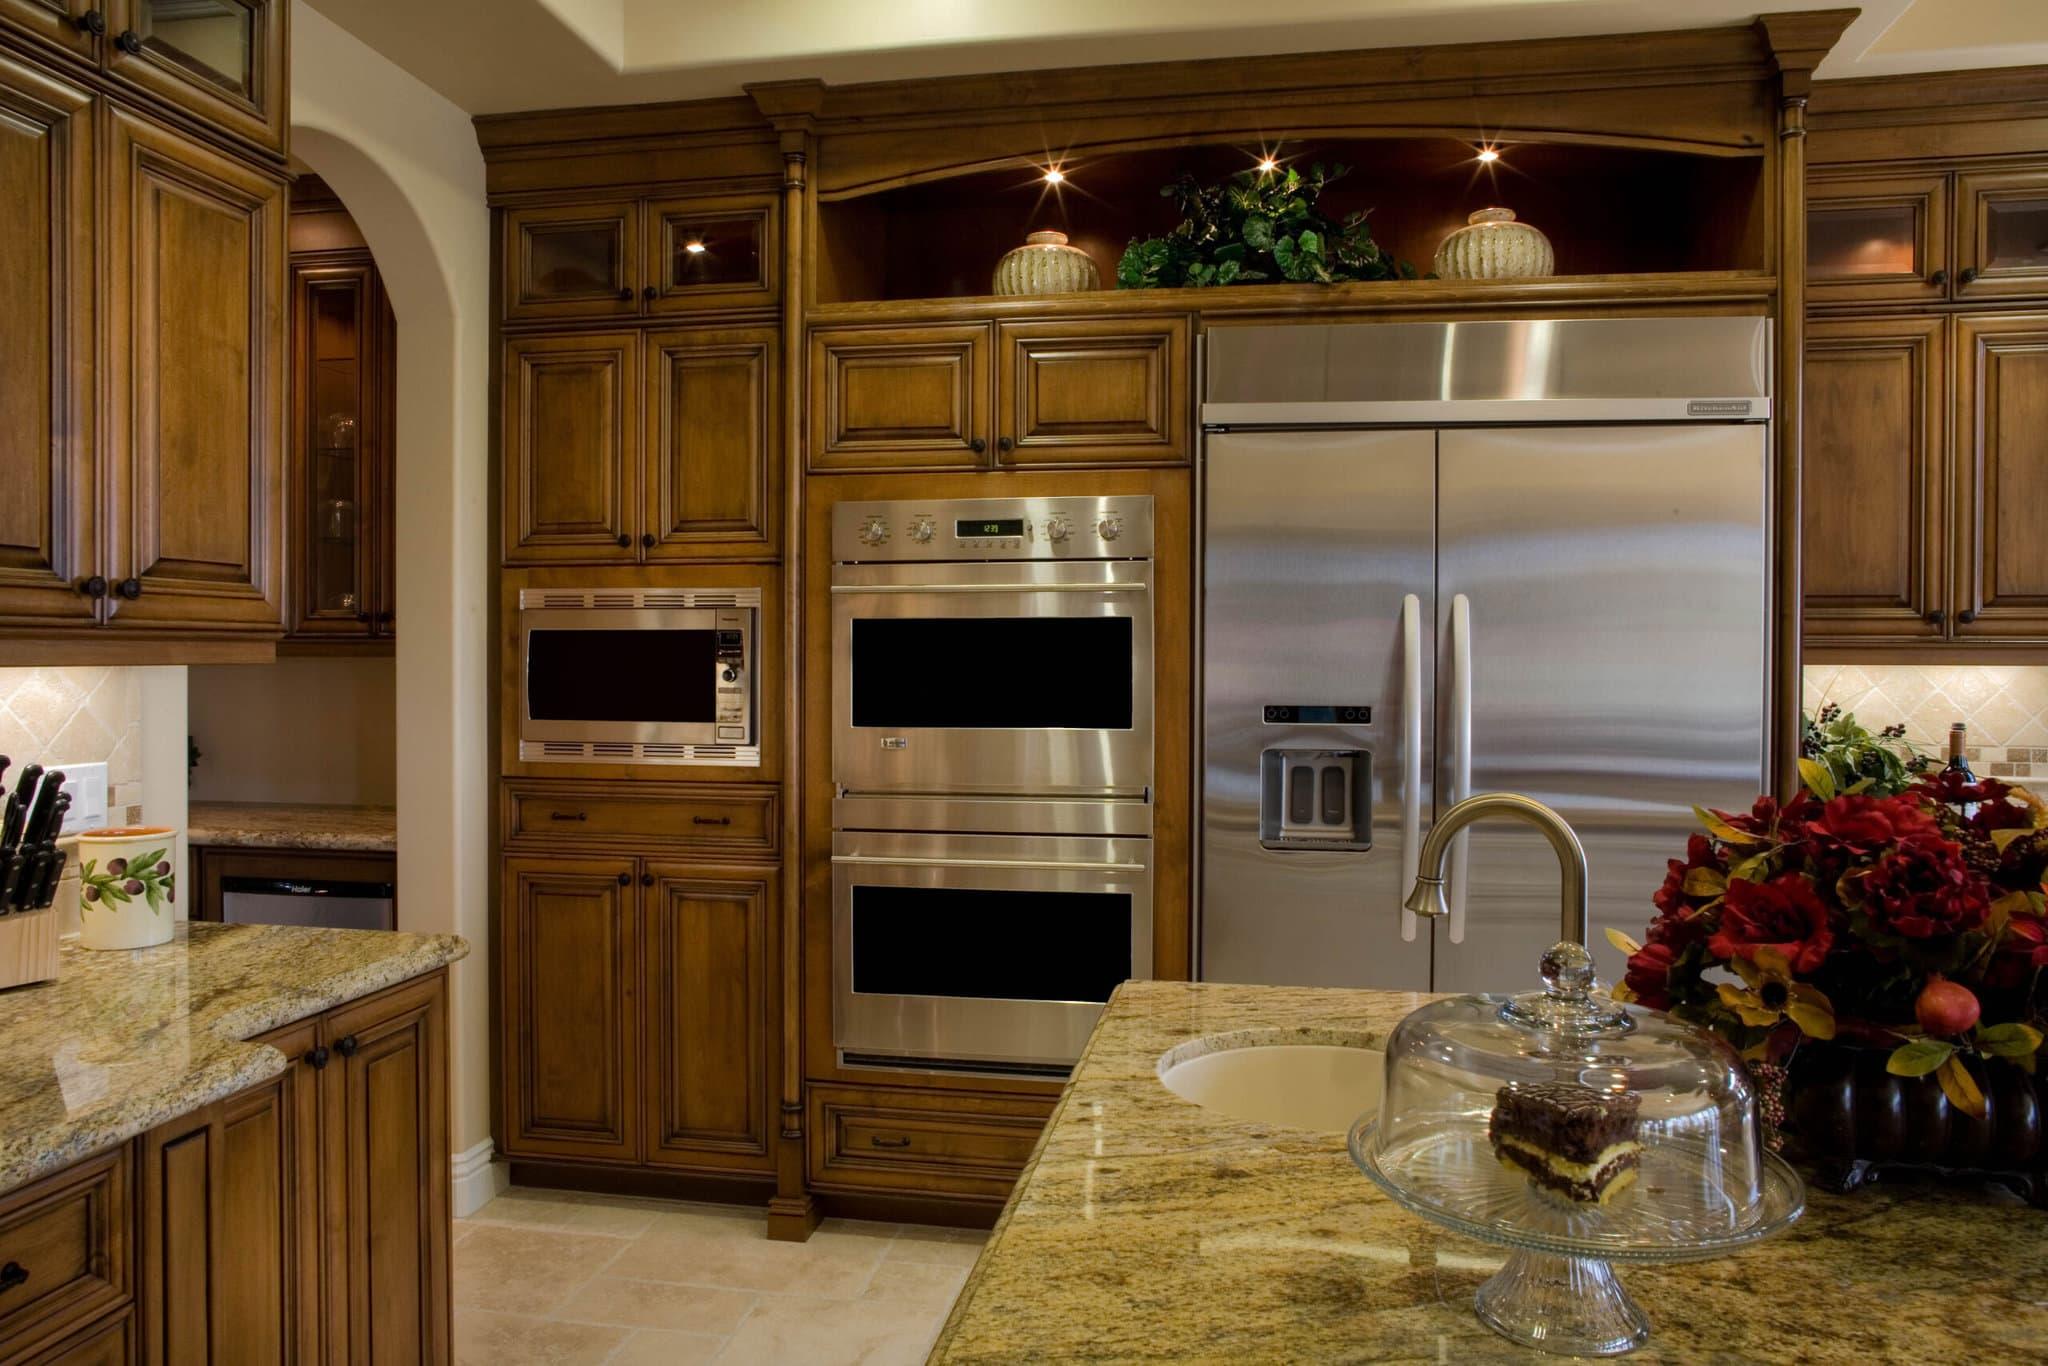 fridge-and-island-compressed